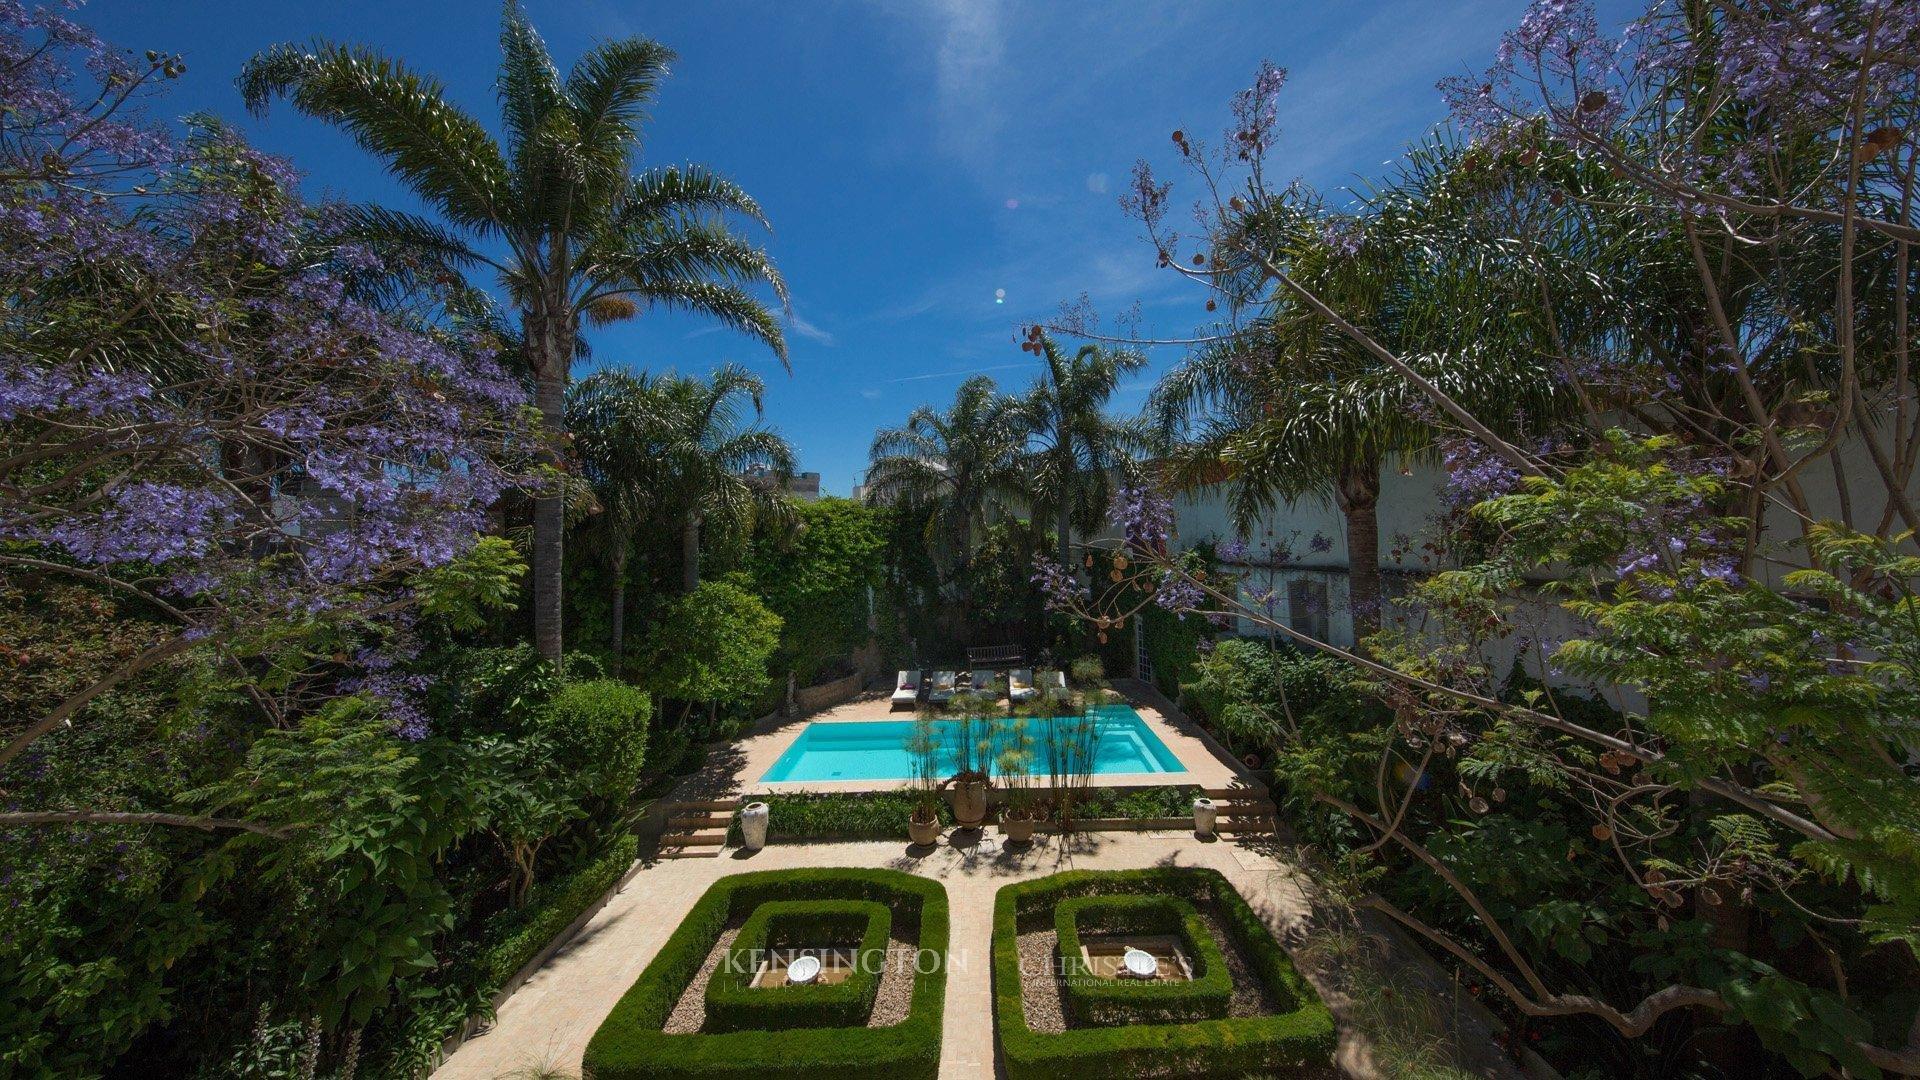 KPPM00824: Villa Tassia Luxury Villa Tanger Morocco